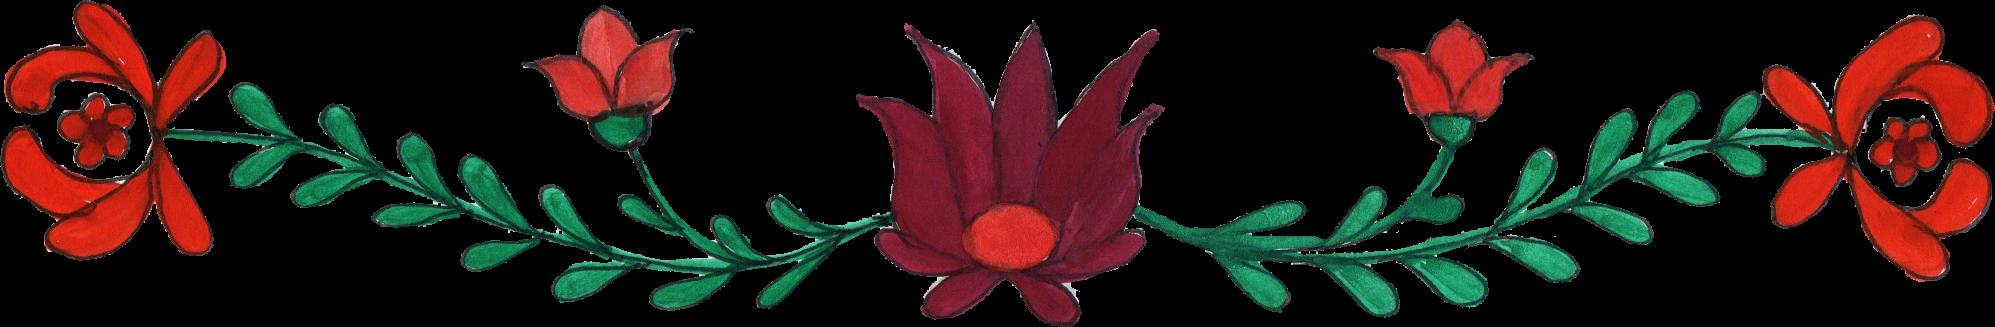 8 Flower Border Drawing Png Transparent Onlygfxcom